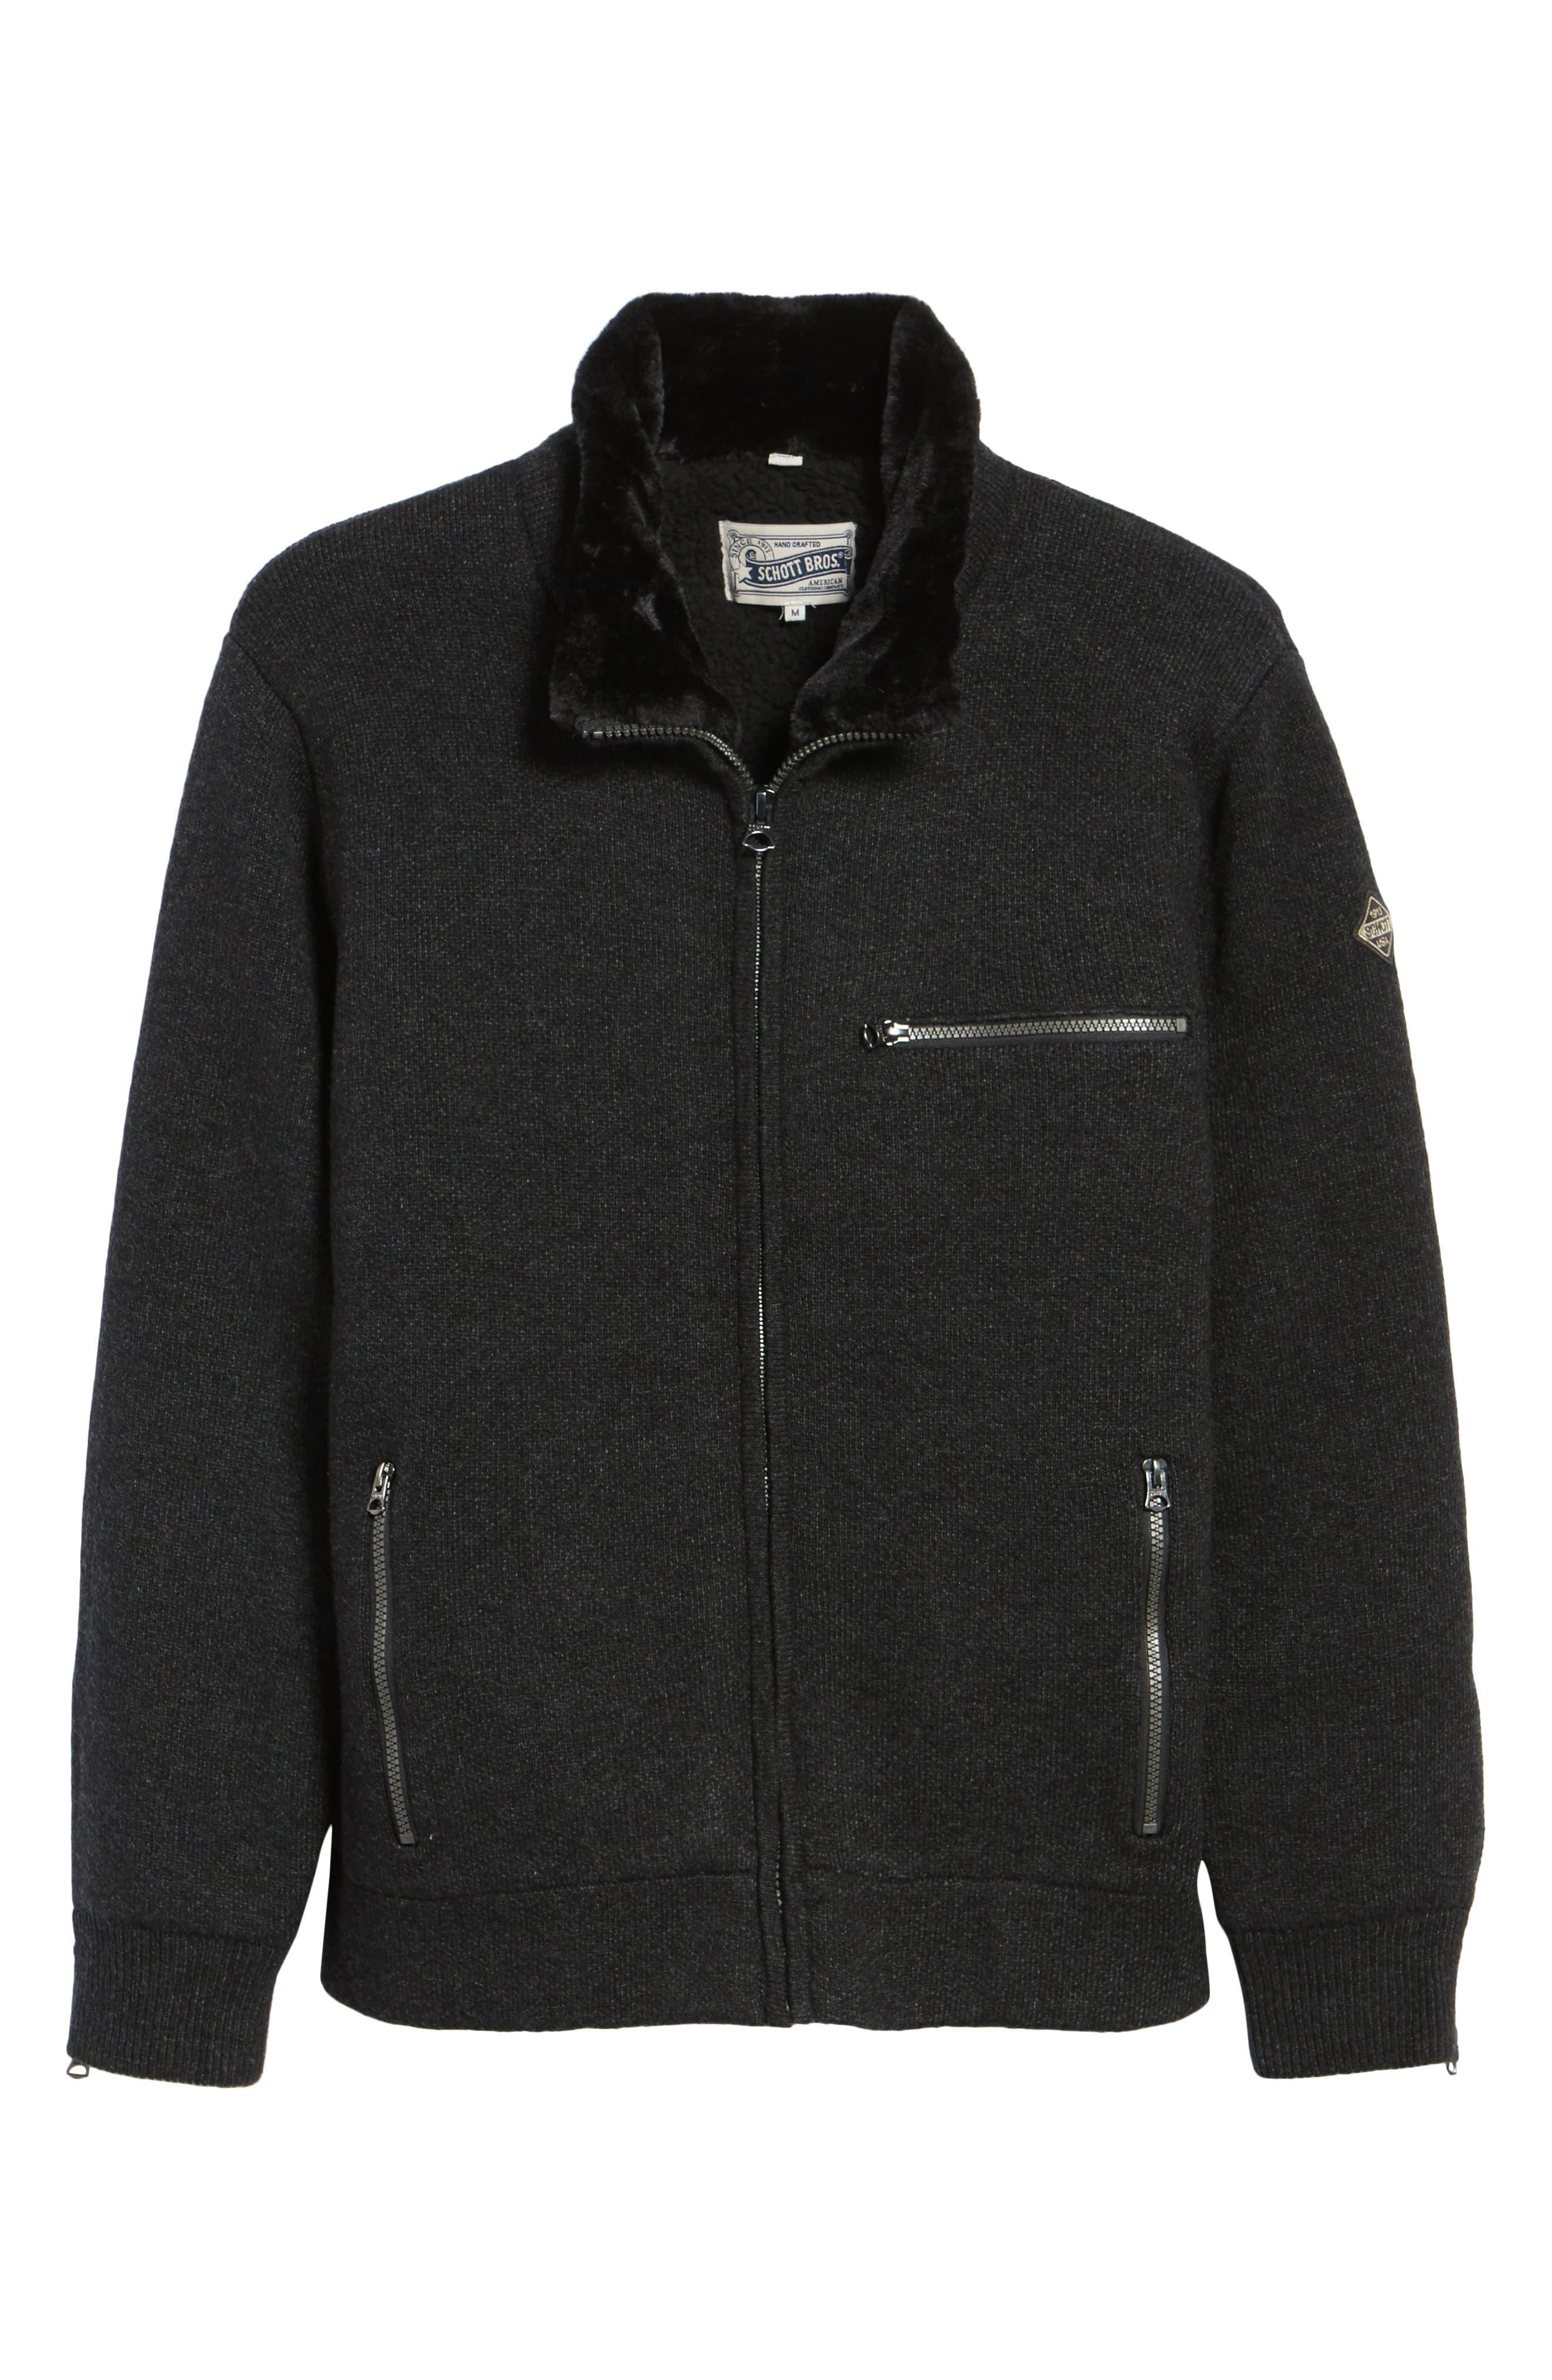 Caf Faux Fur Lined Sweater Jacket,                             Alternate thumbnail 6, color,                             BLACK